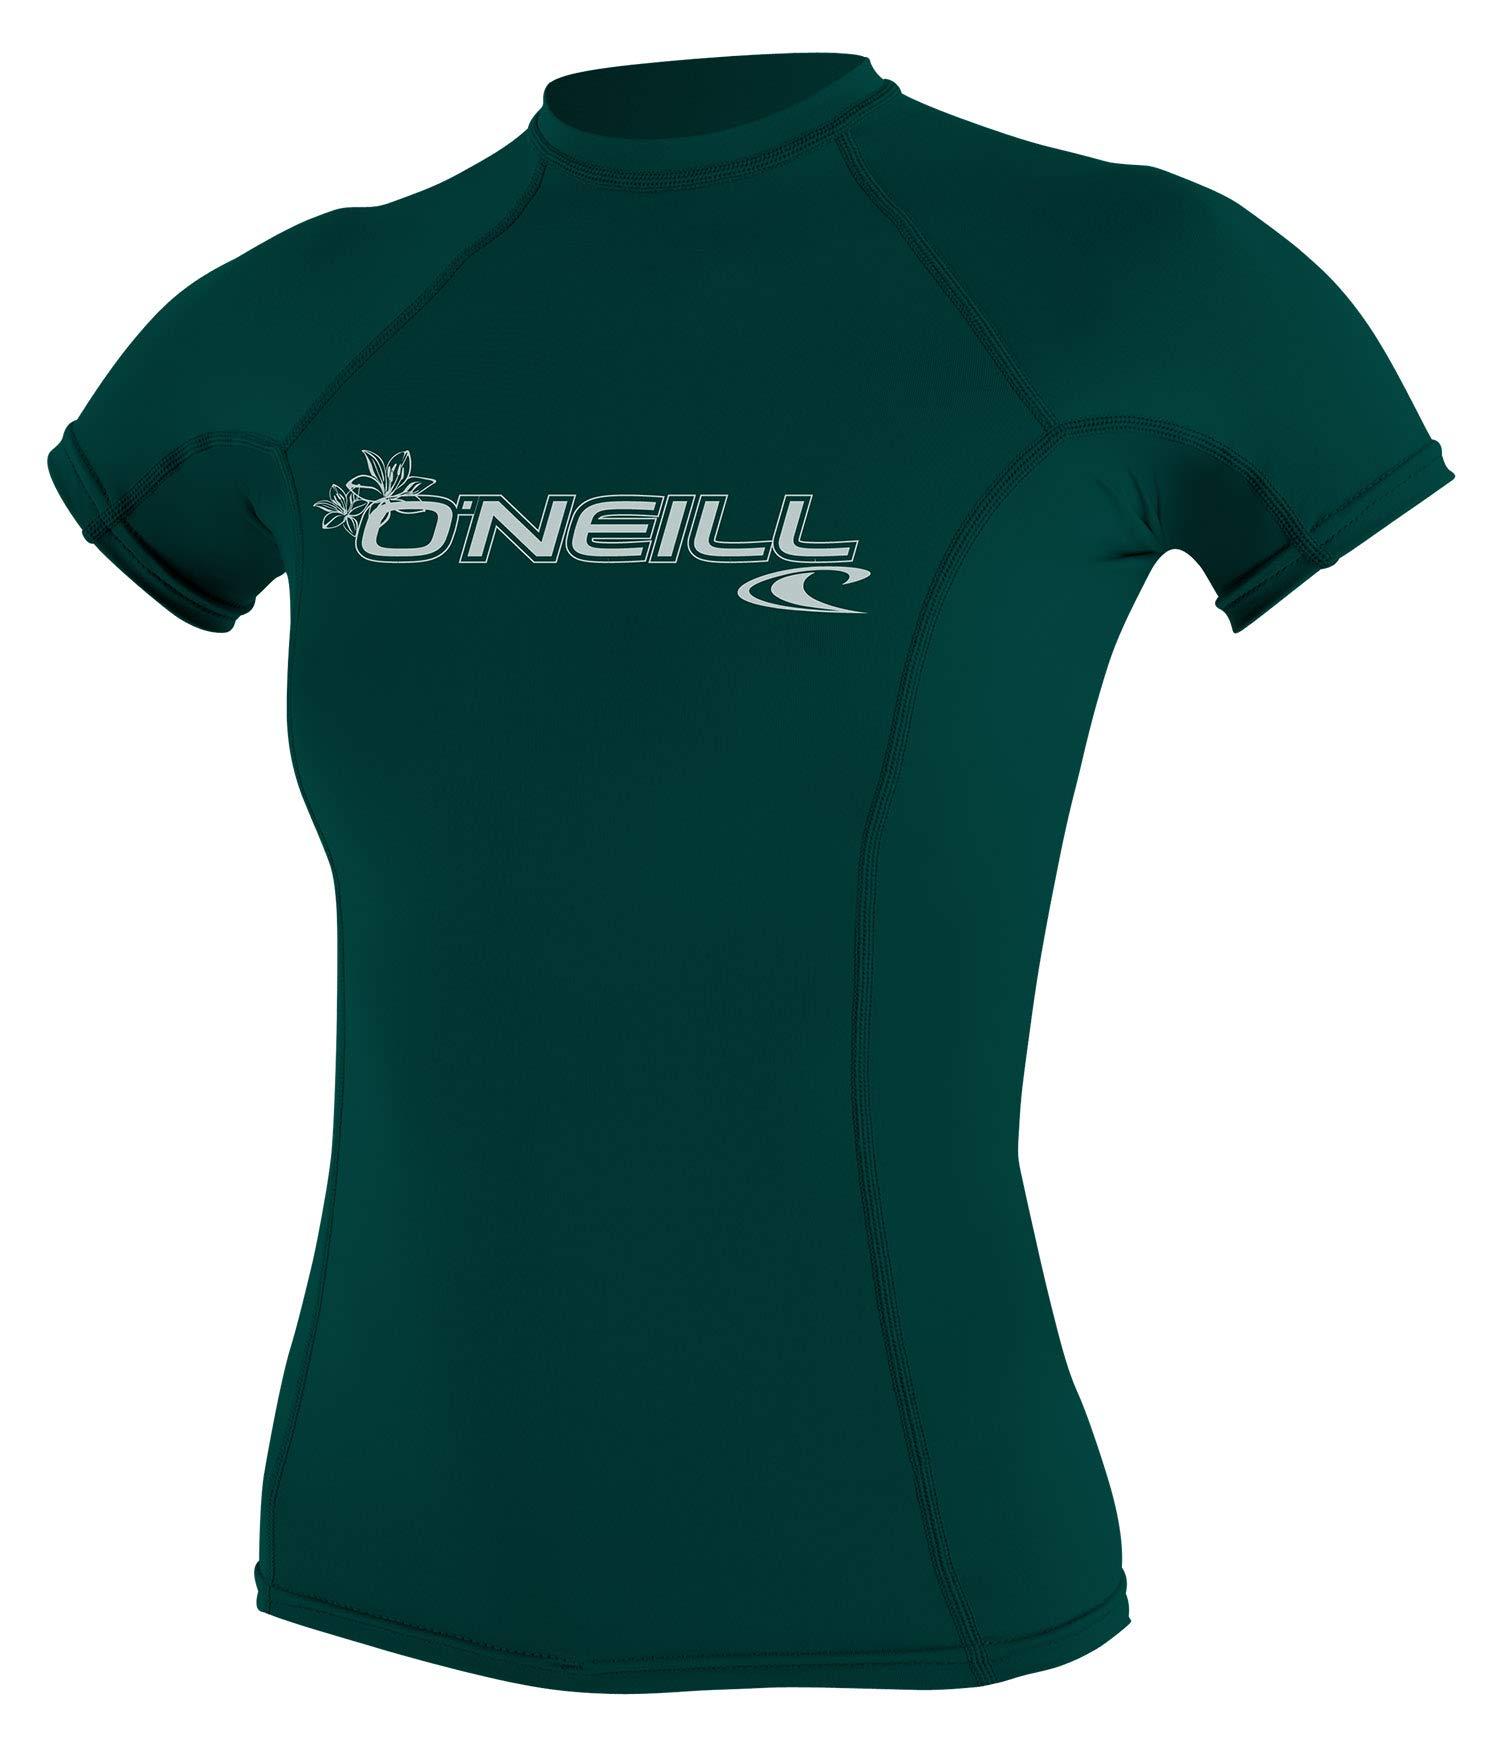 O'Neill Women Basic Upf50+ S/S Tops, Deep Green, XS by O'Neill Wetsuits